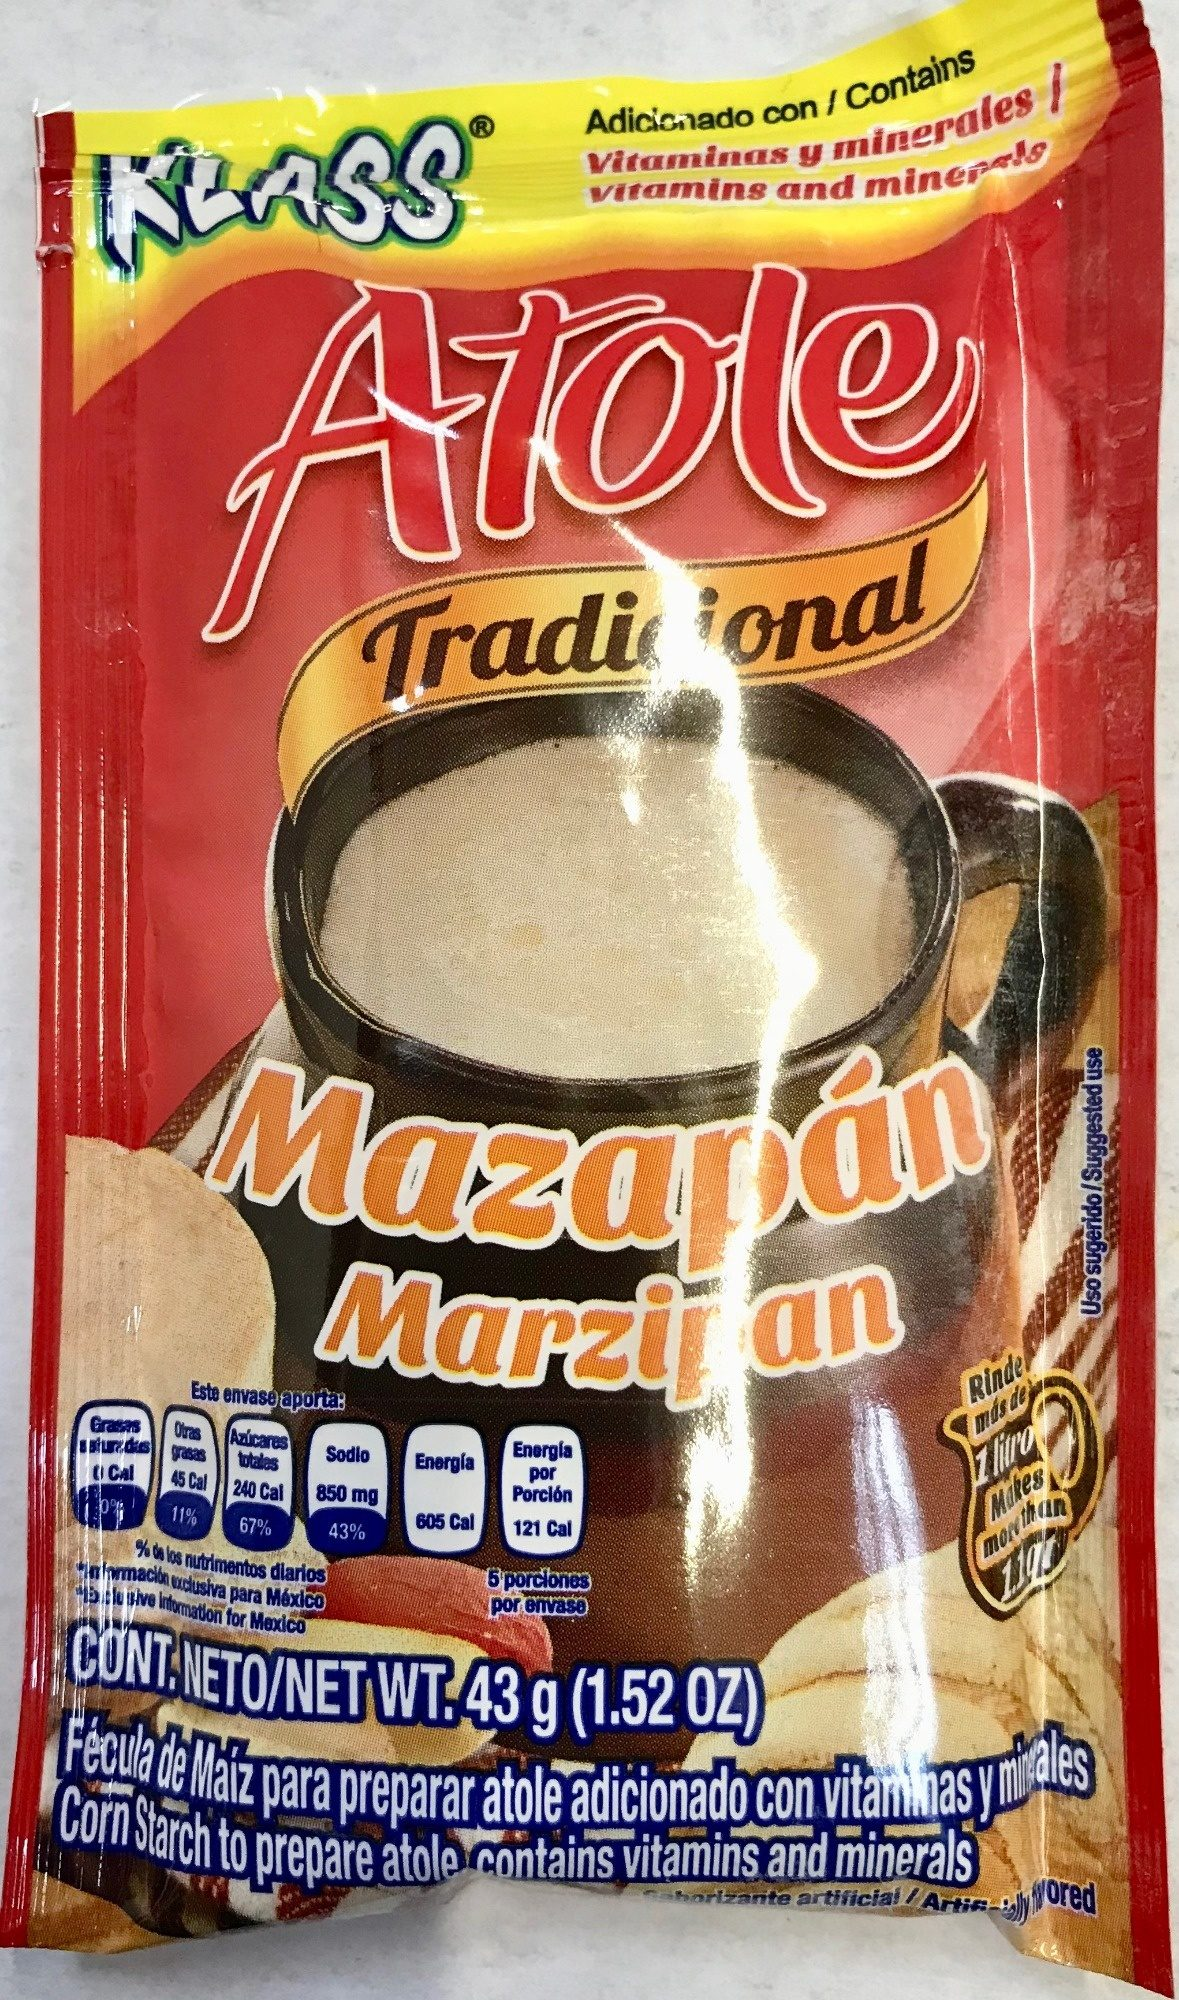 Fécula de maíz para preparar atole - Product - es